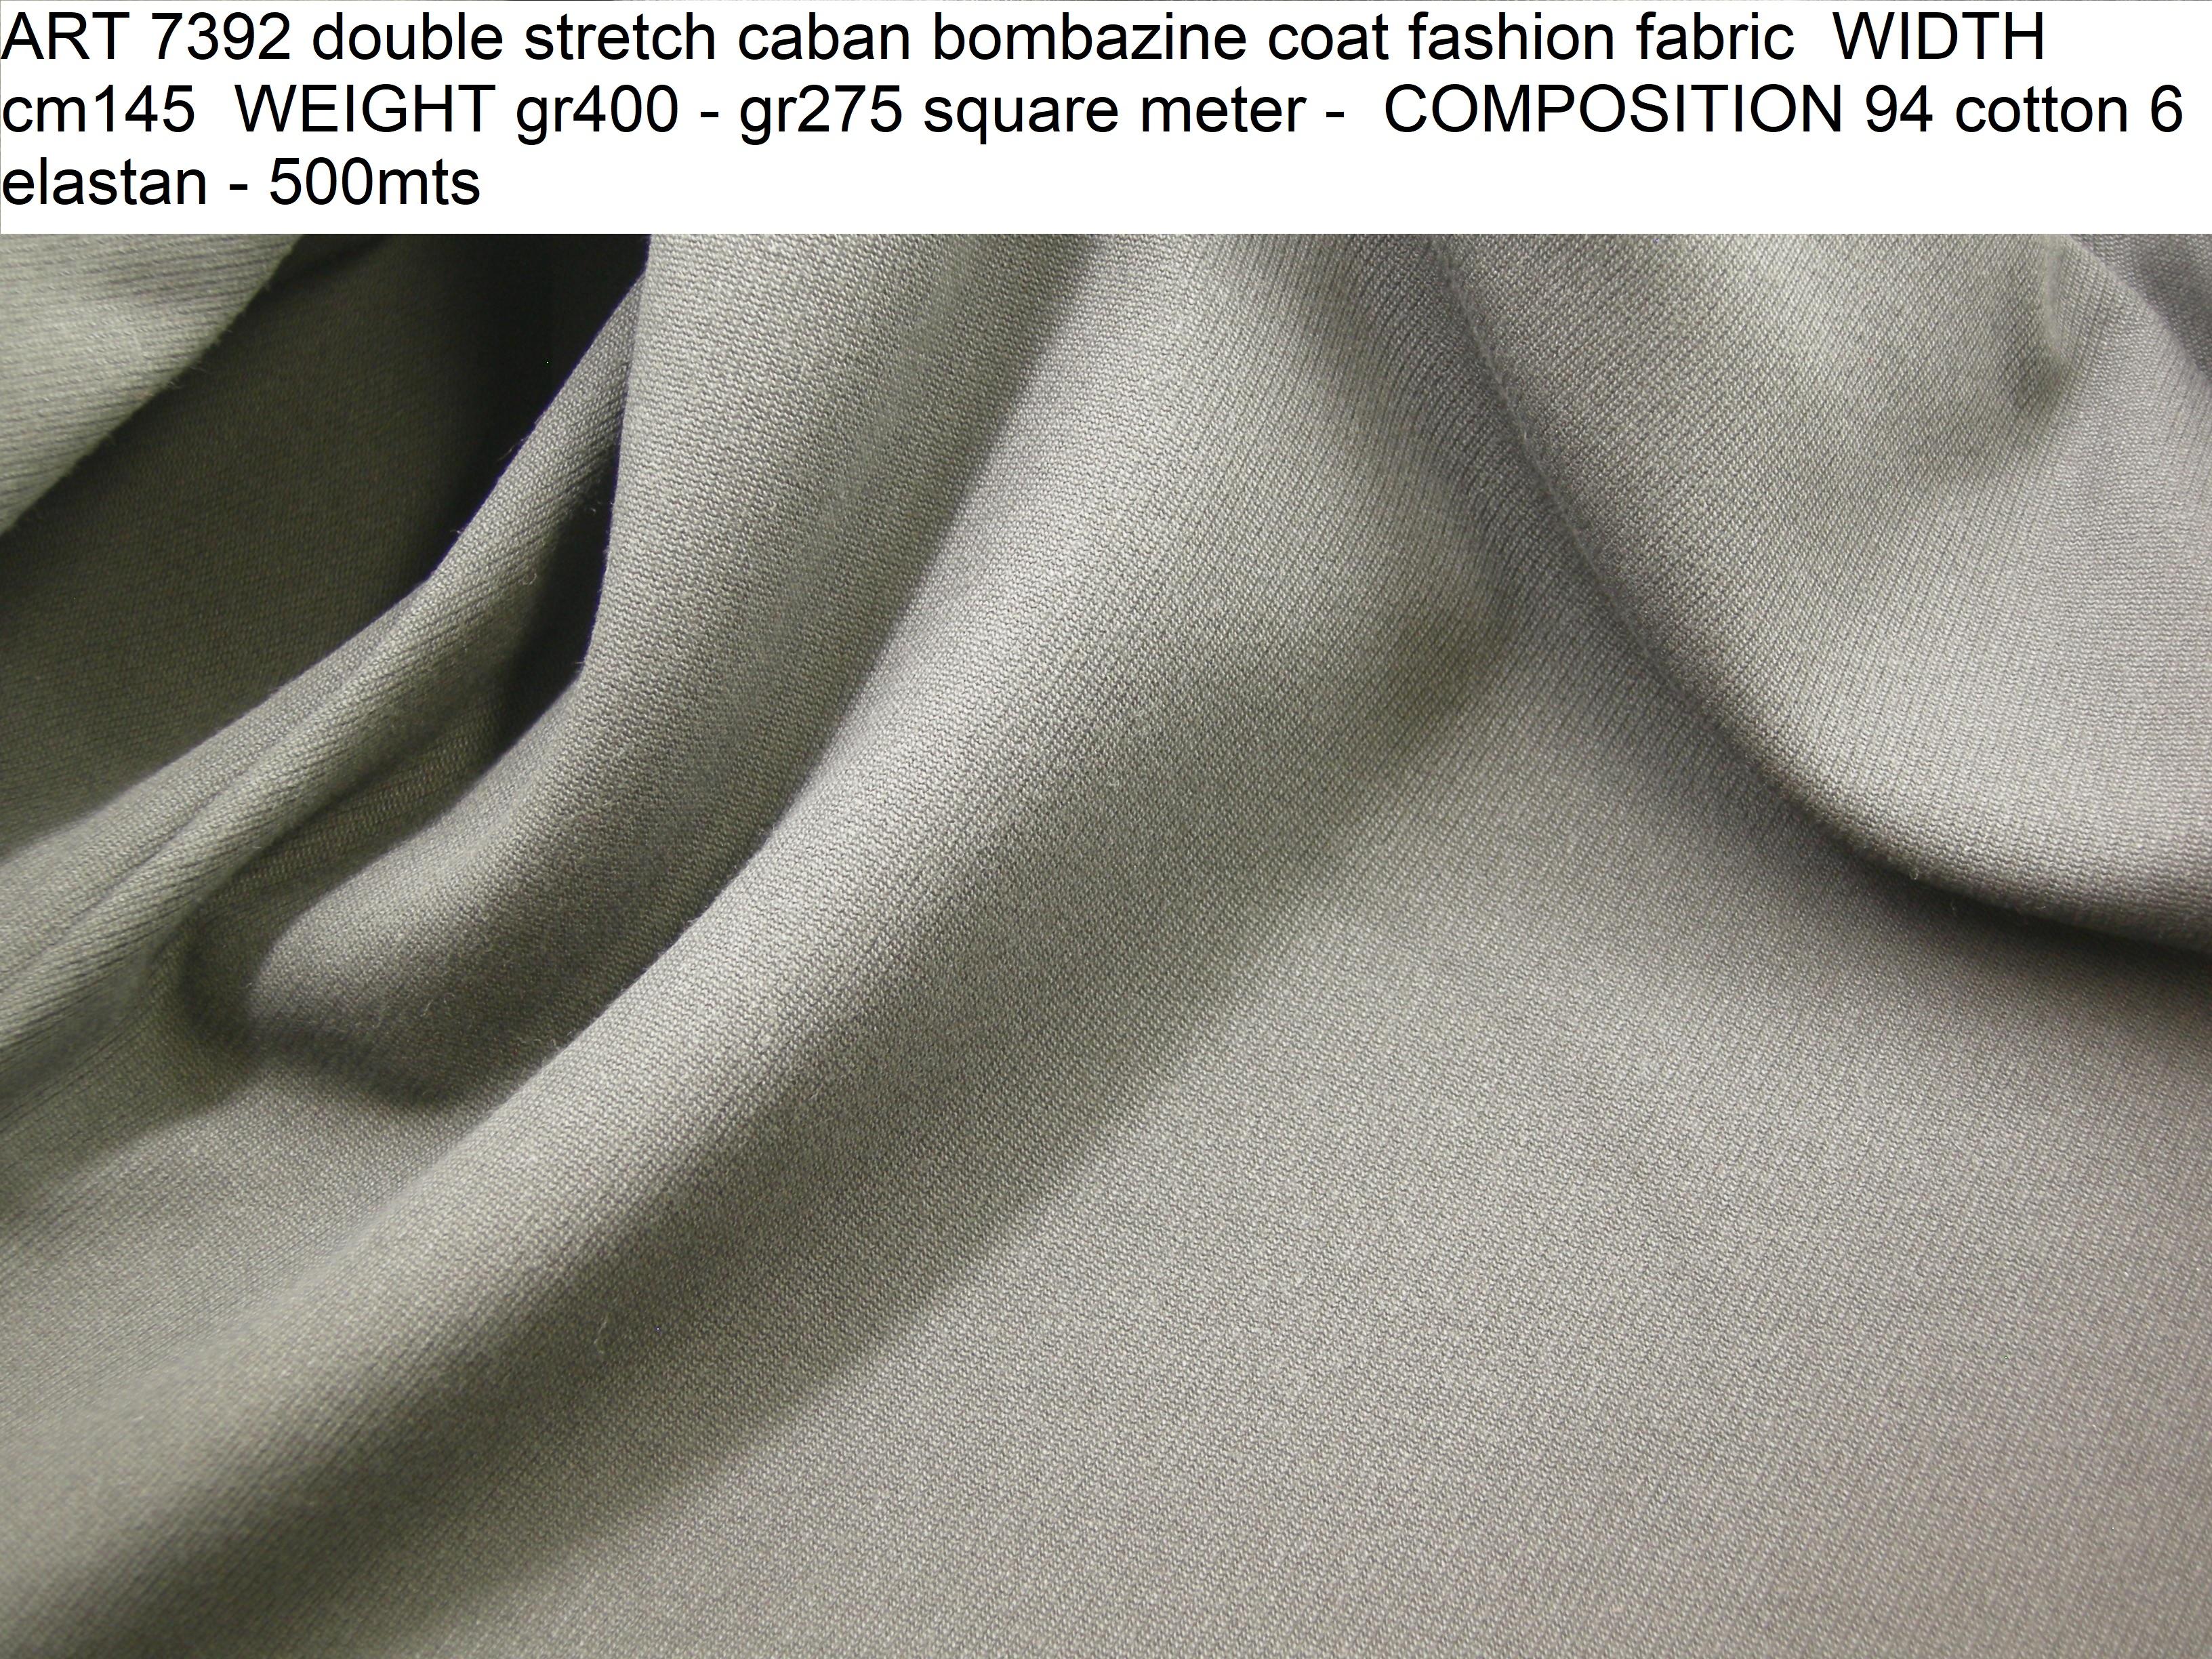 ART 7392 double stretch caban bombazine coat fashion fabric WIDTH cm145 WEIGHT gr400 - gr275 square meter - COMPOSITION 94 cotton 6 elastan - 500mts